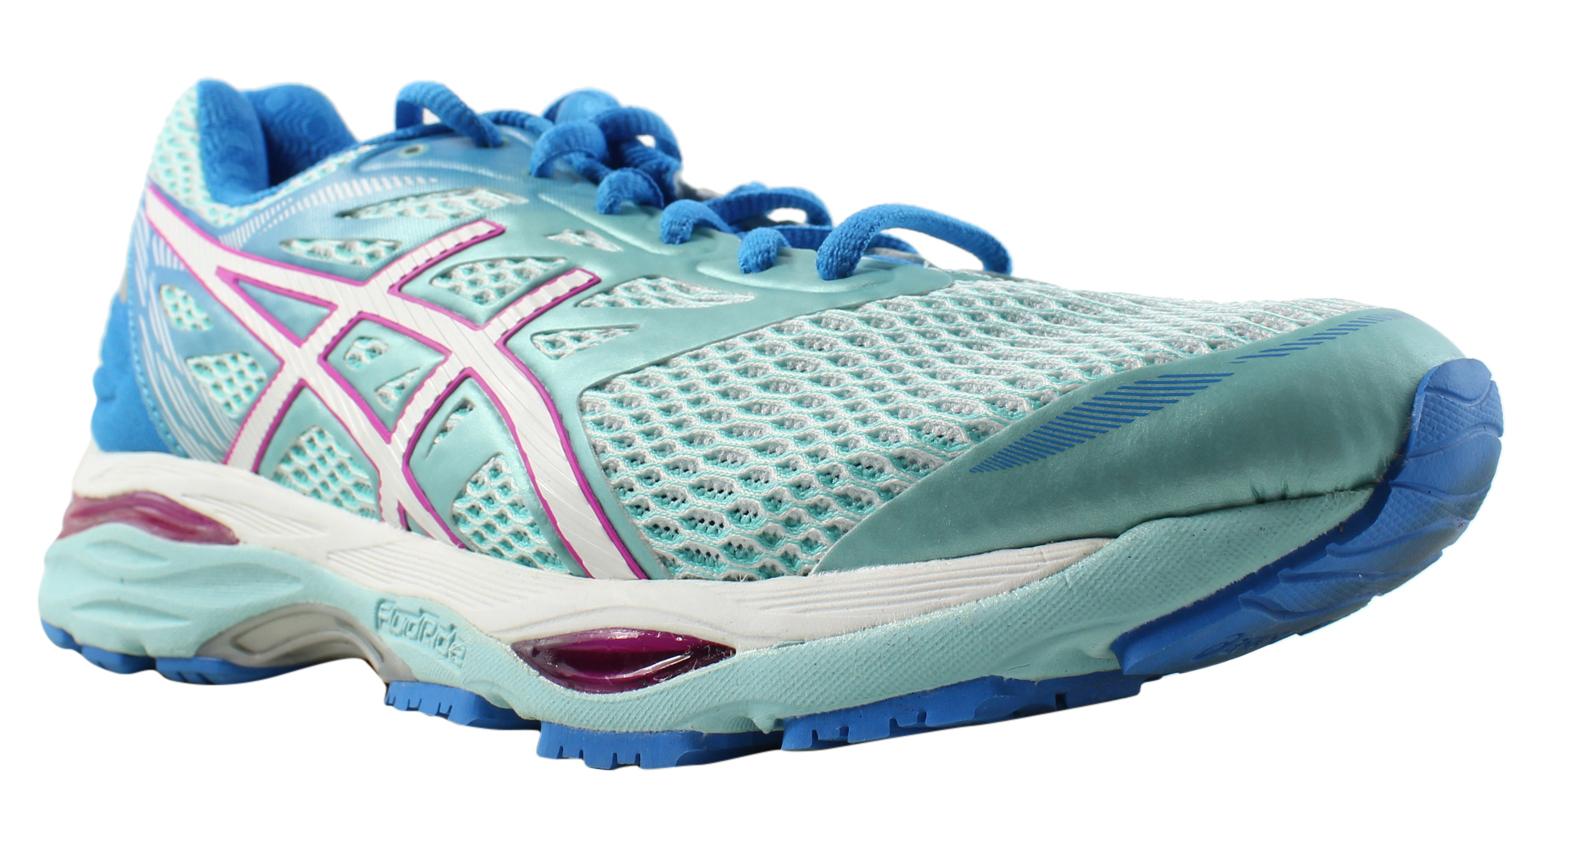 ASICS Damenschuhe - Blau Running Schuhes Größe 8 Wide (C, D, W) (346519)